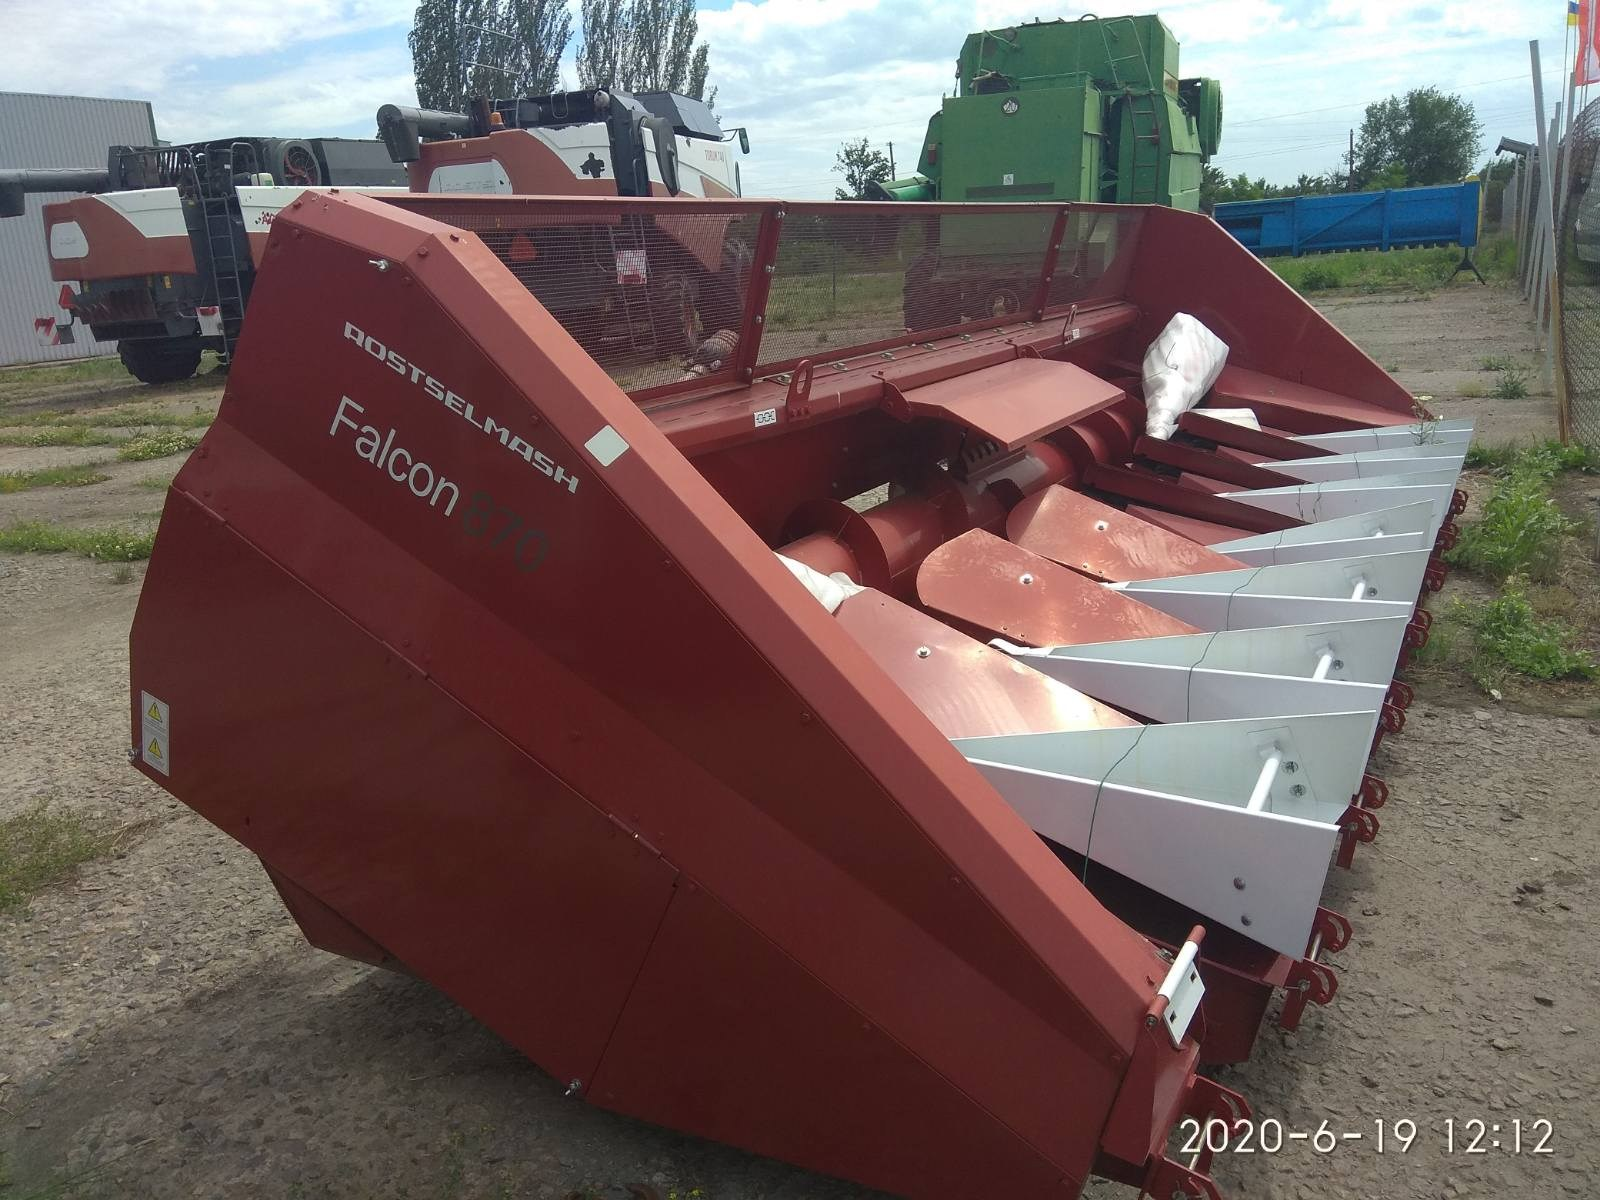 автобазар украины - Продажа 2020 г.в.  Трактор МТЗ Пропонуємо новий каток КРП-6(к